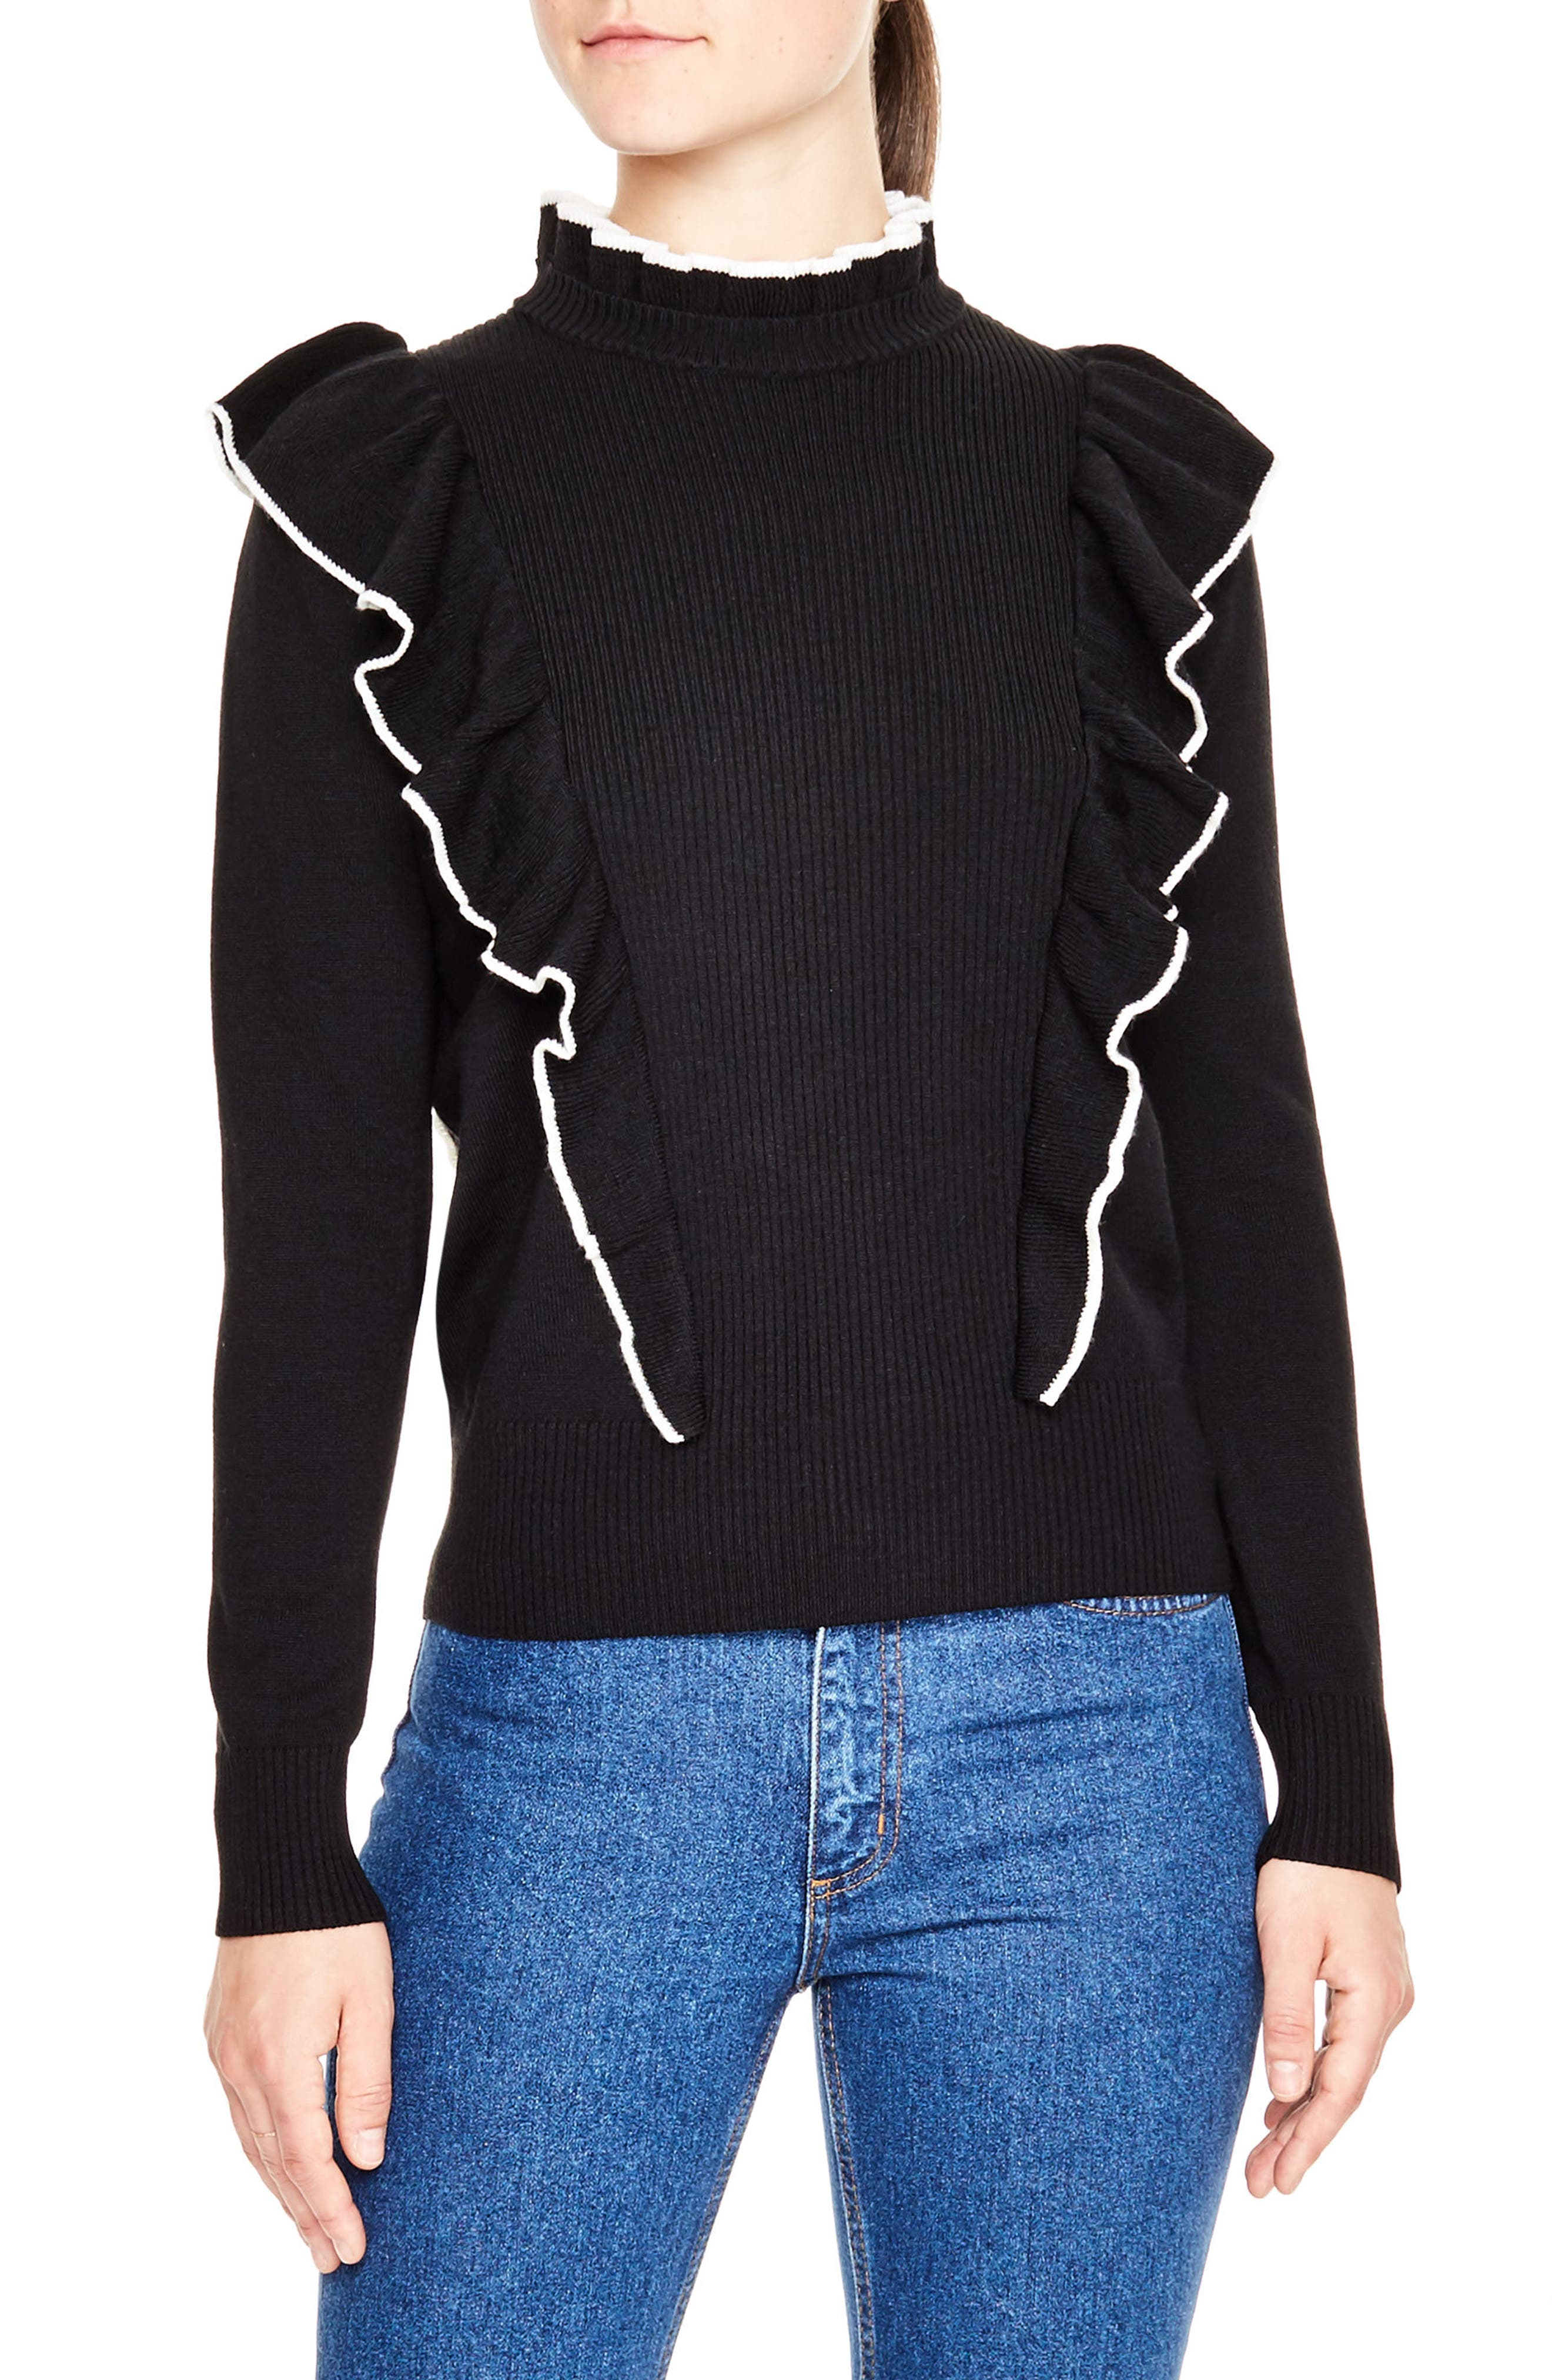 Alternate Image 1 Selected - sandro Ruffle Turtleneck Sweater